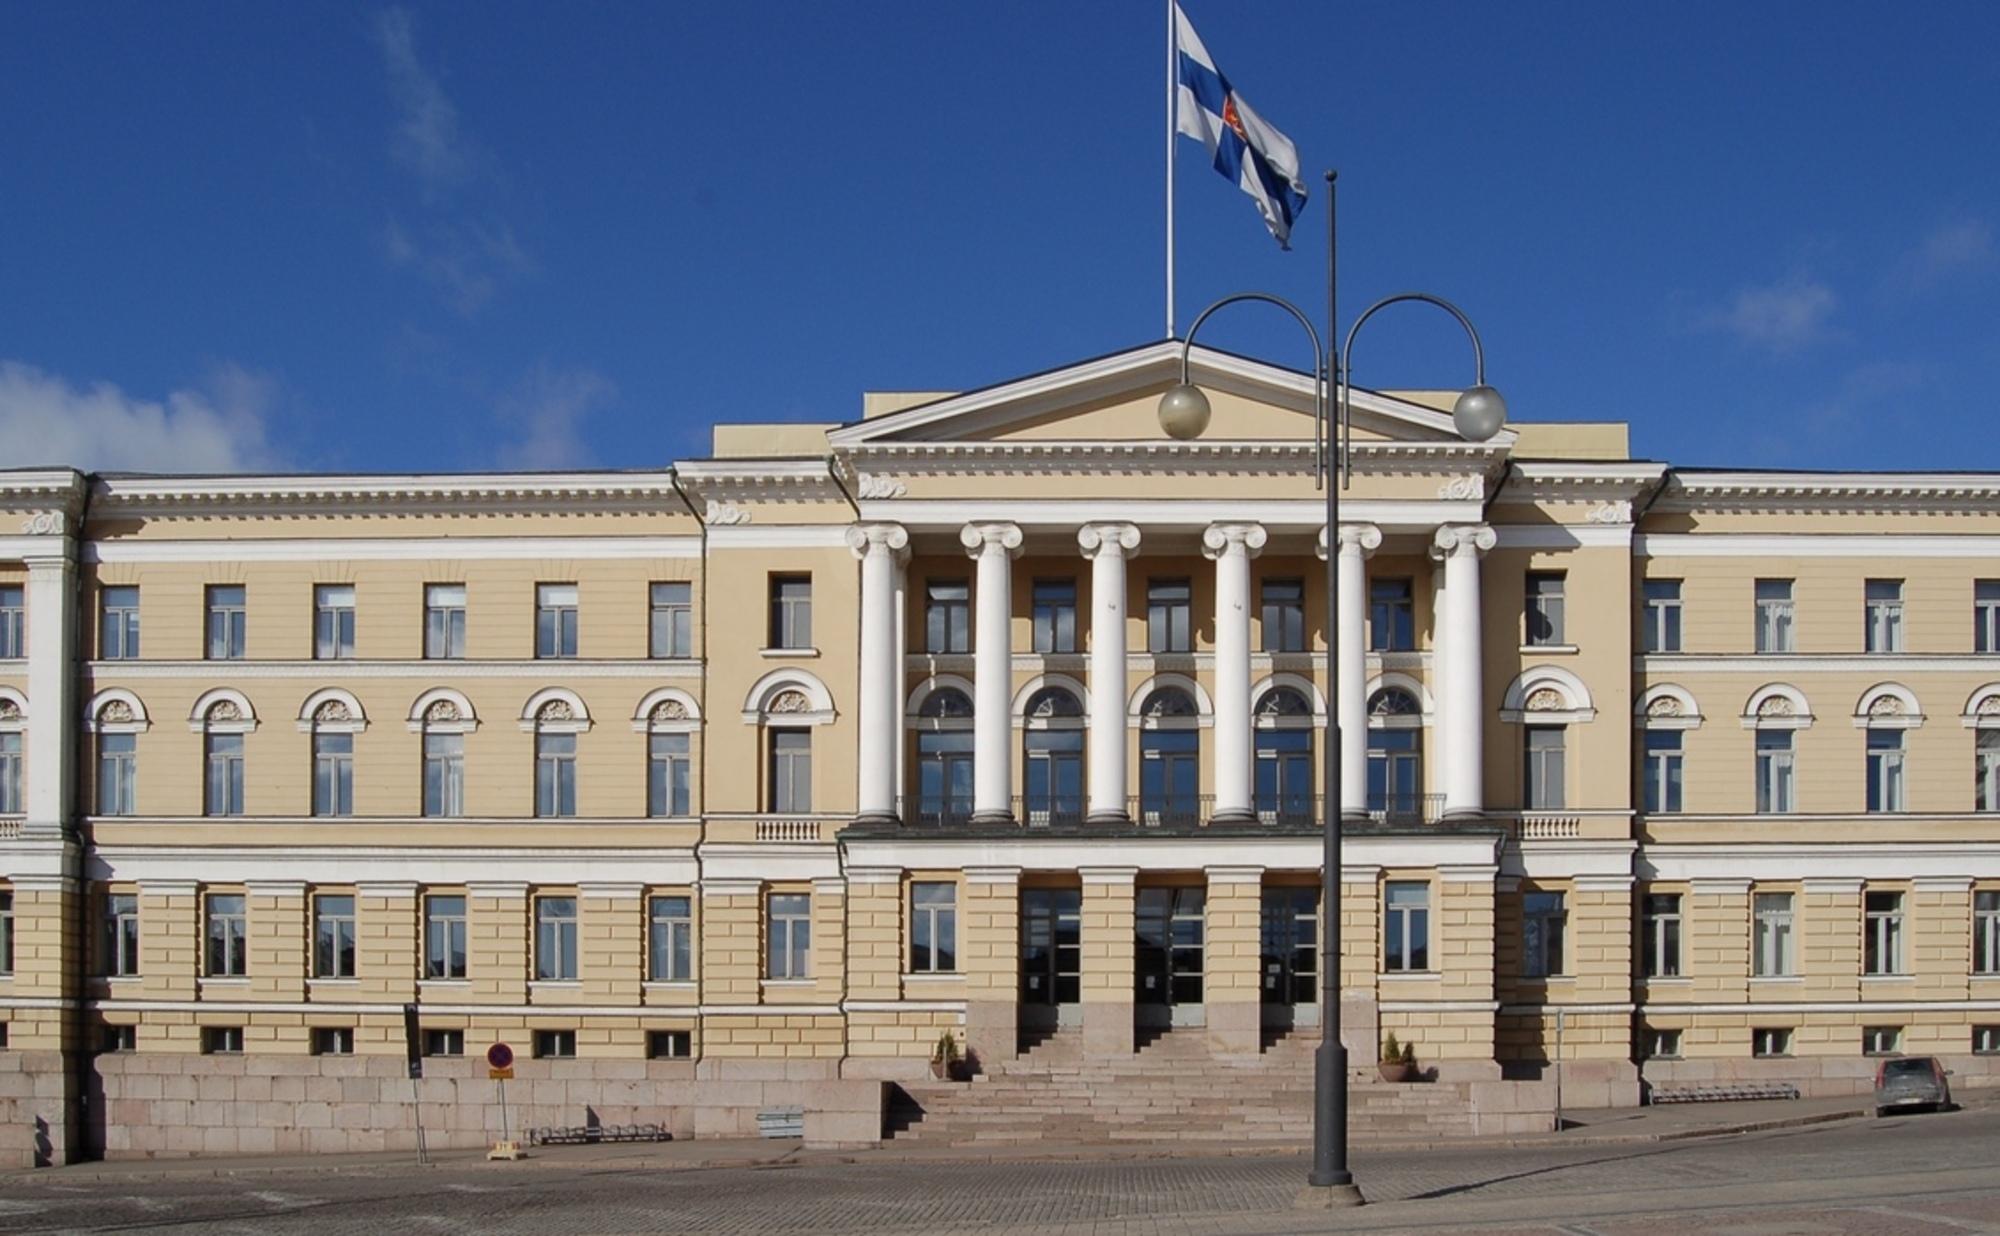 Mats Engblom, Marketing Specialist at the University of Helsinki,